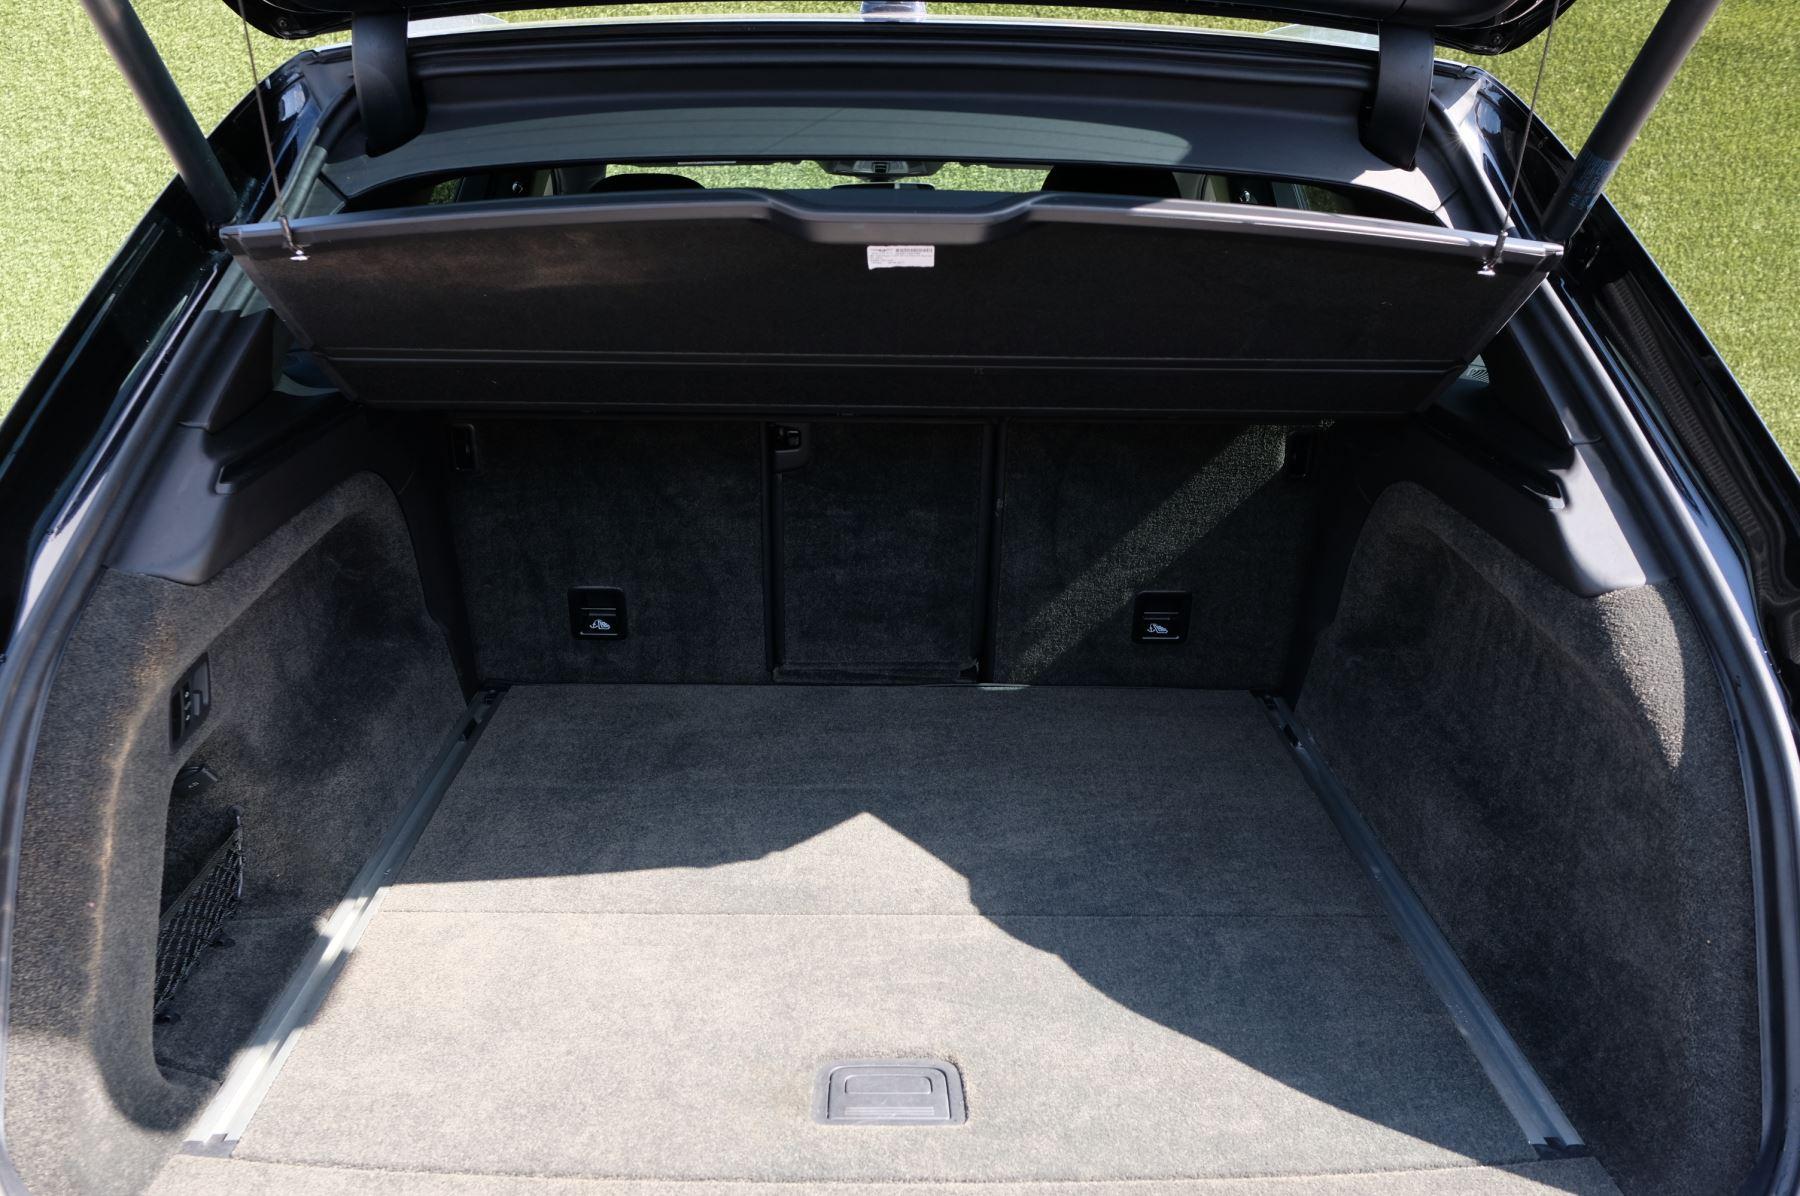 Bentley Bentayga 4.0 V8 5dr image 9